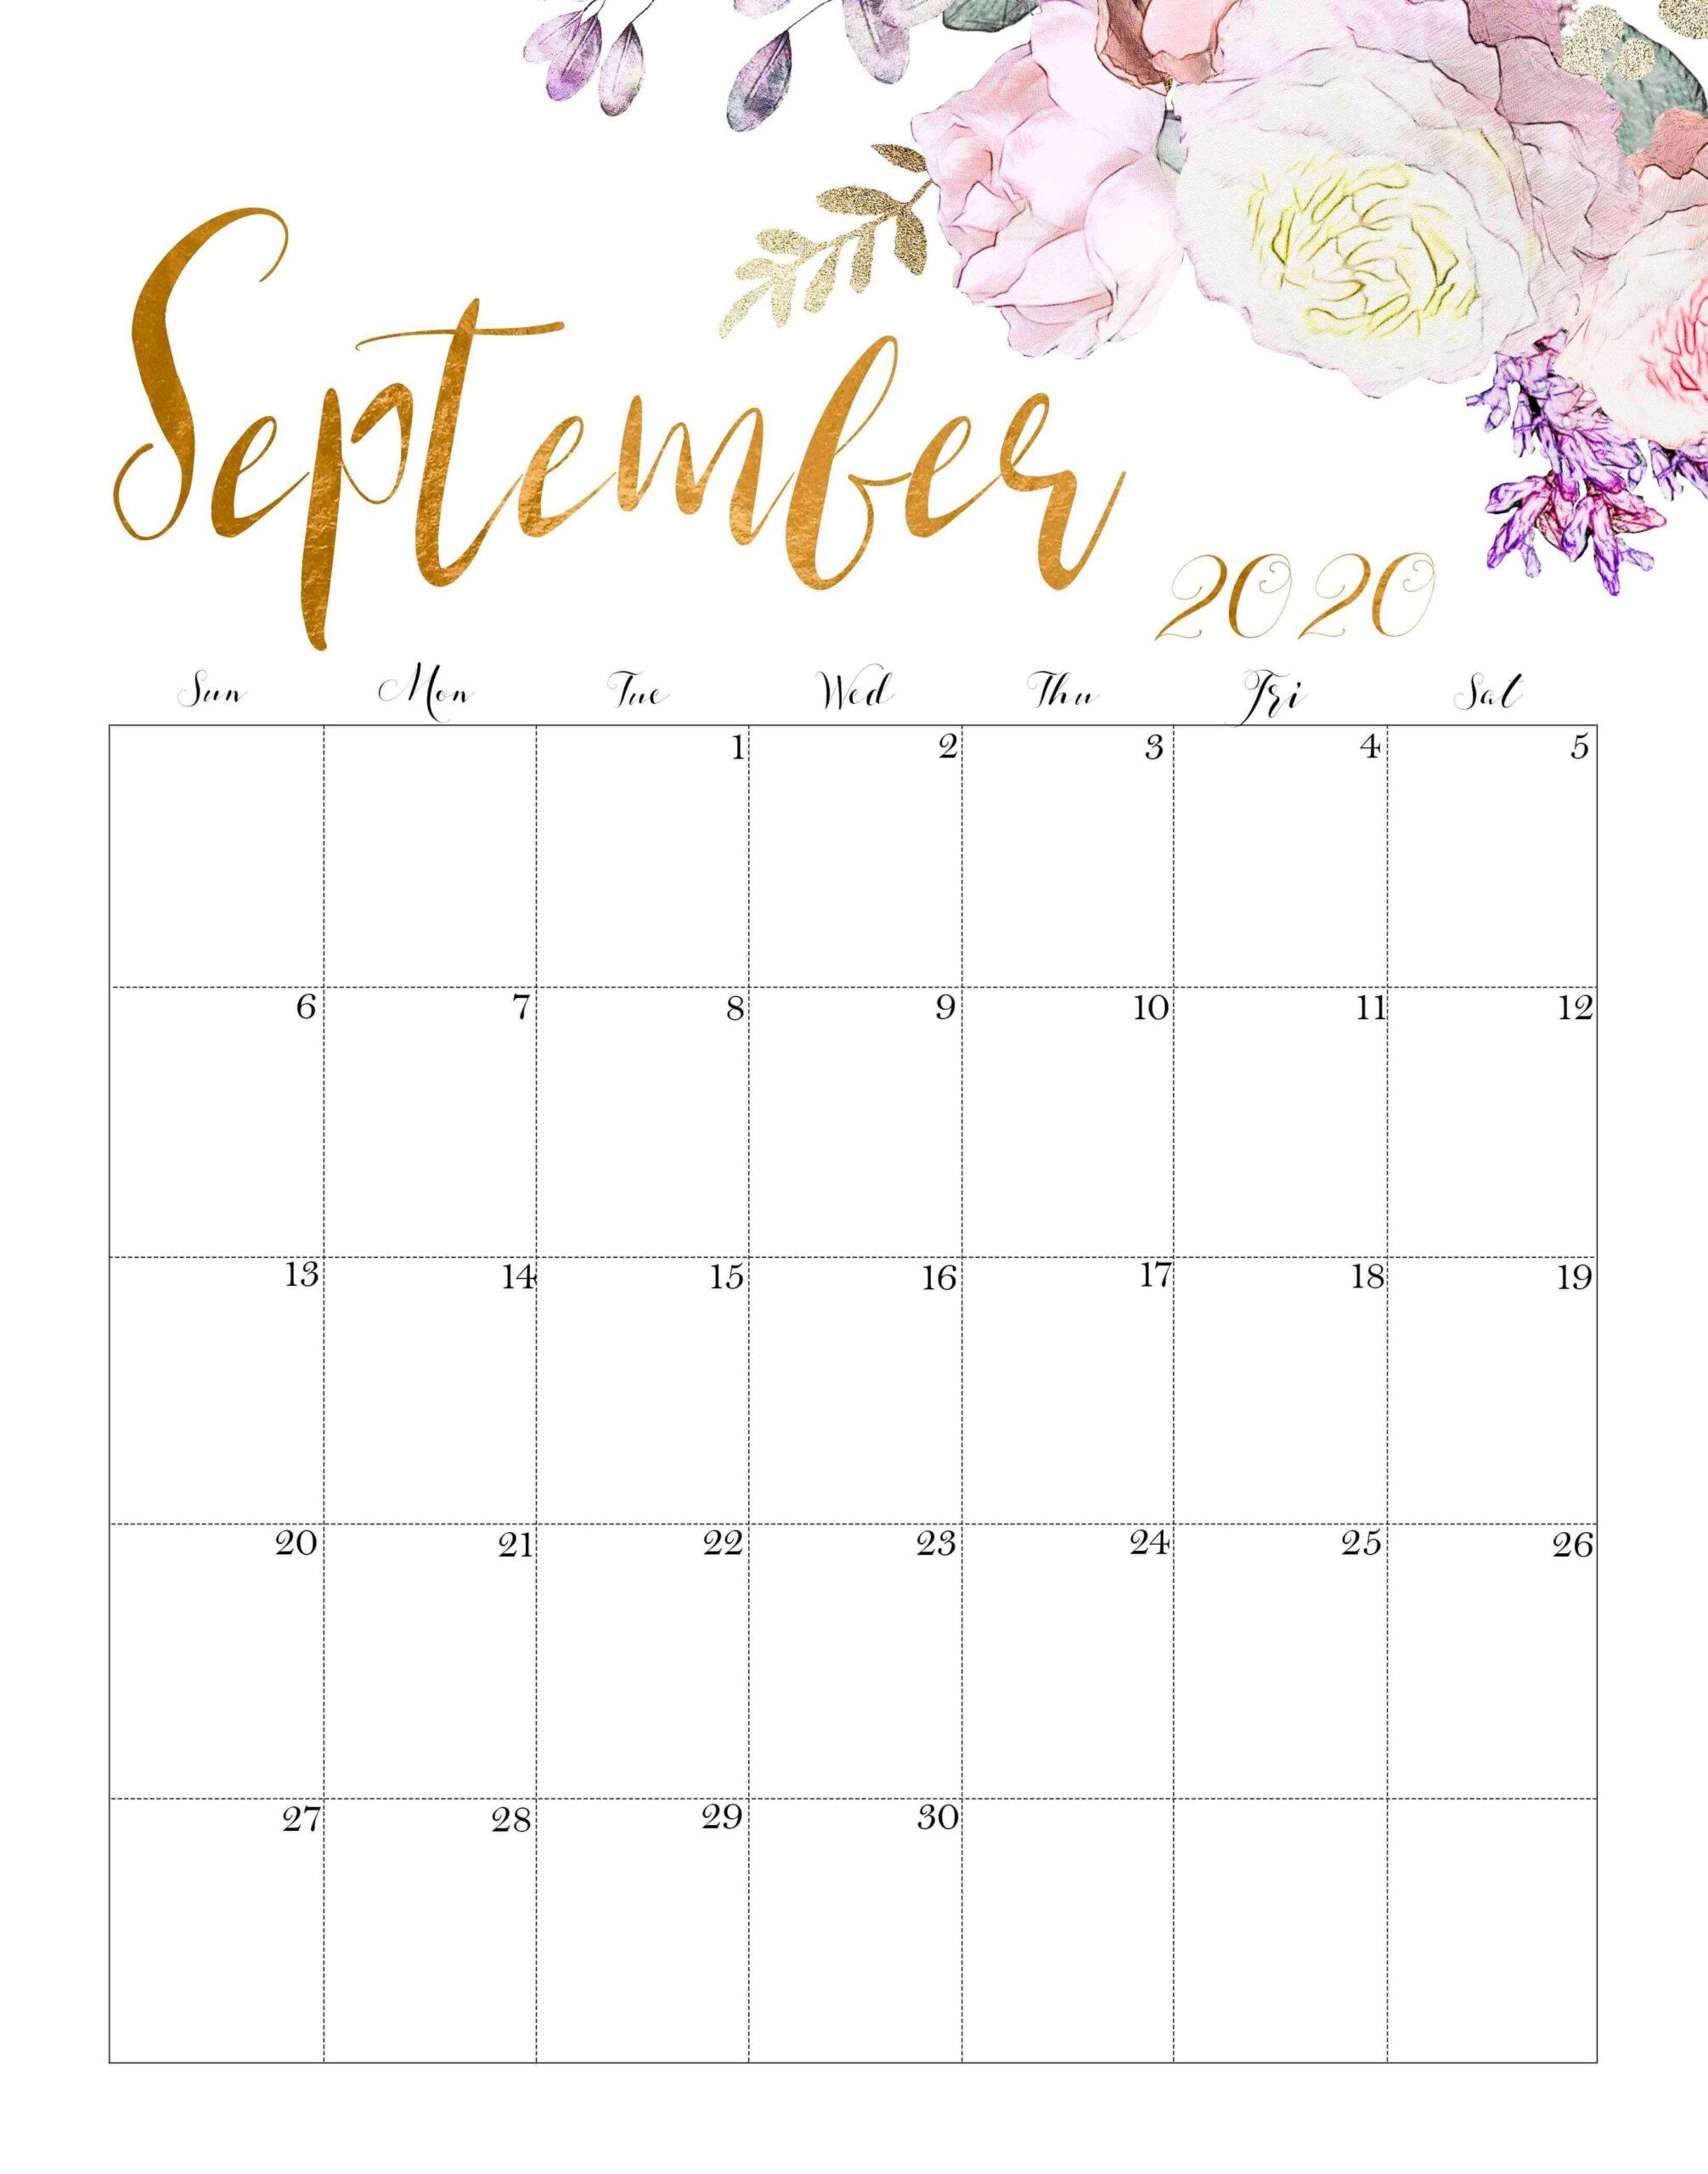 Decorative September 2020 Floral Calendar